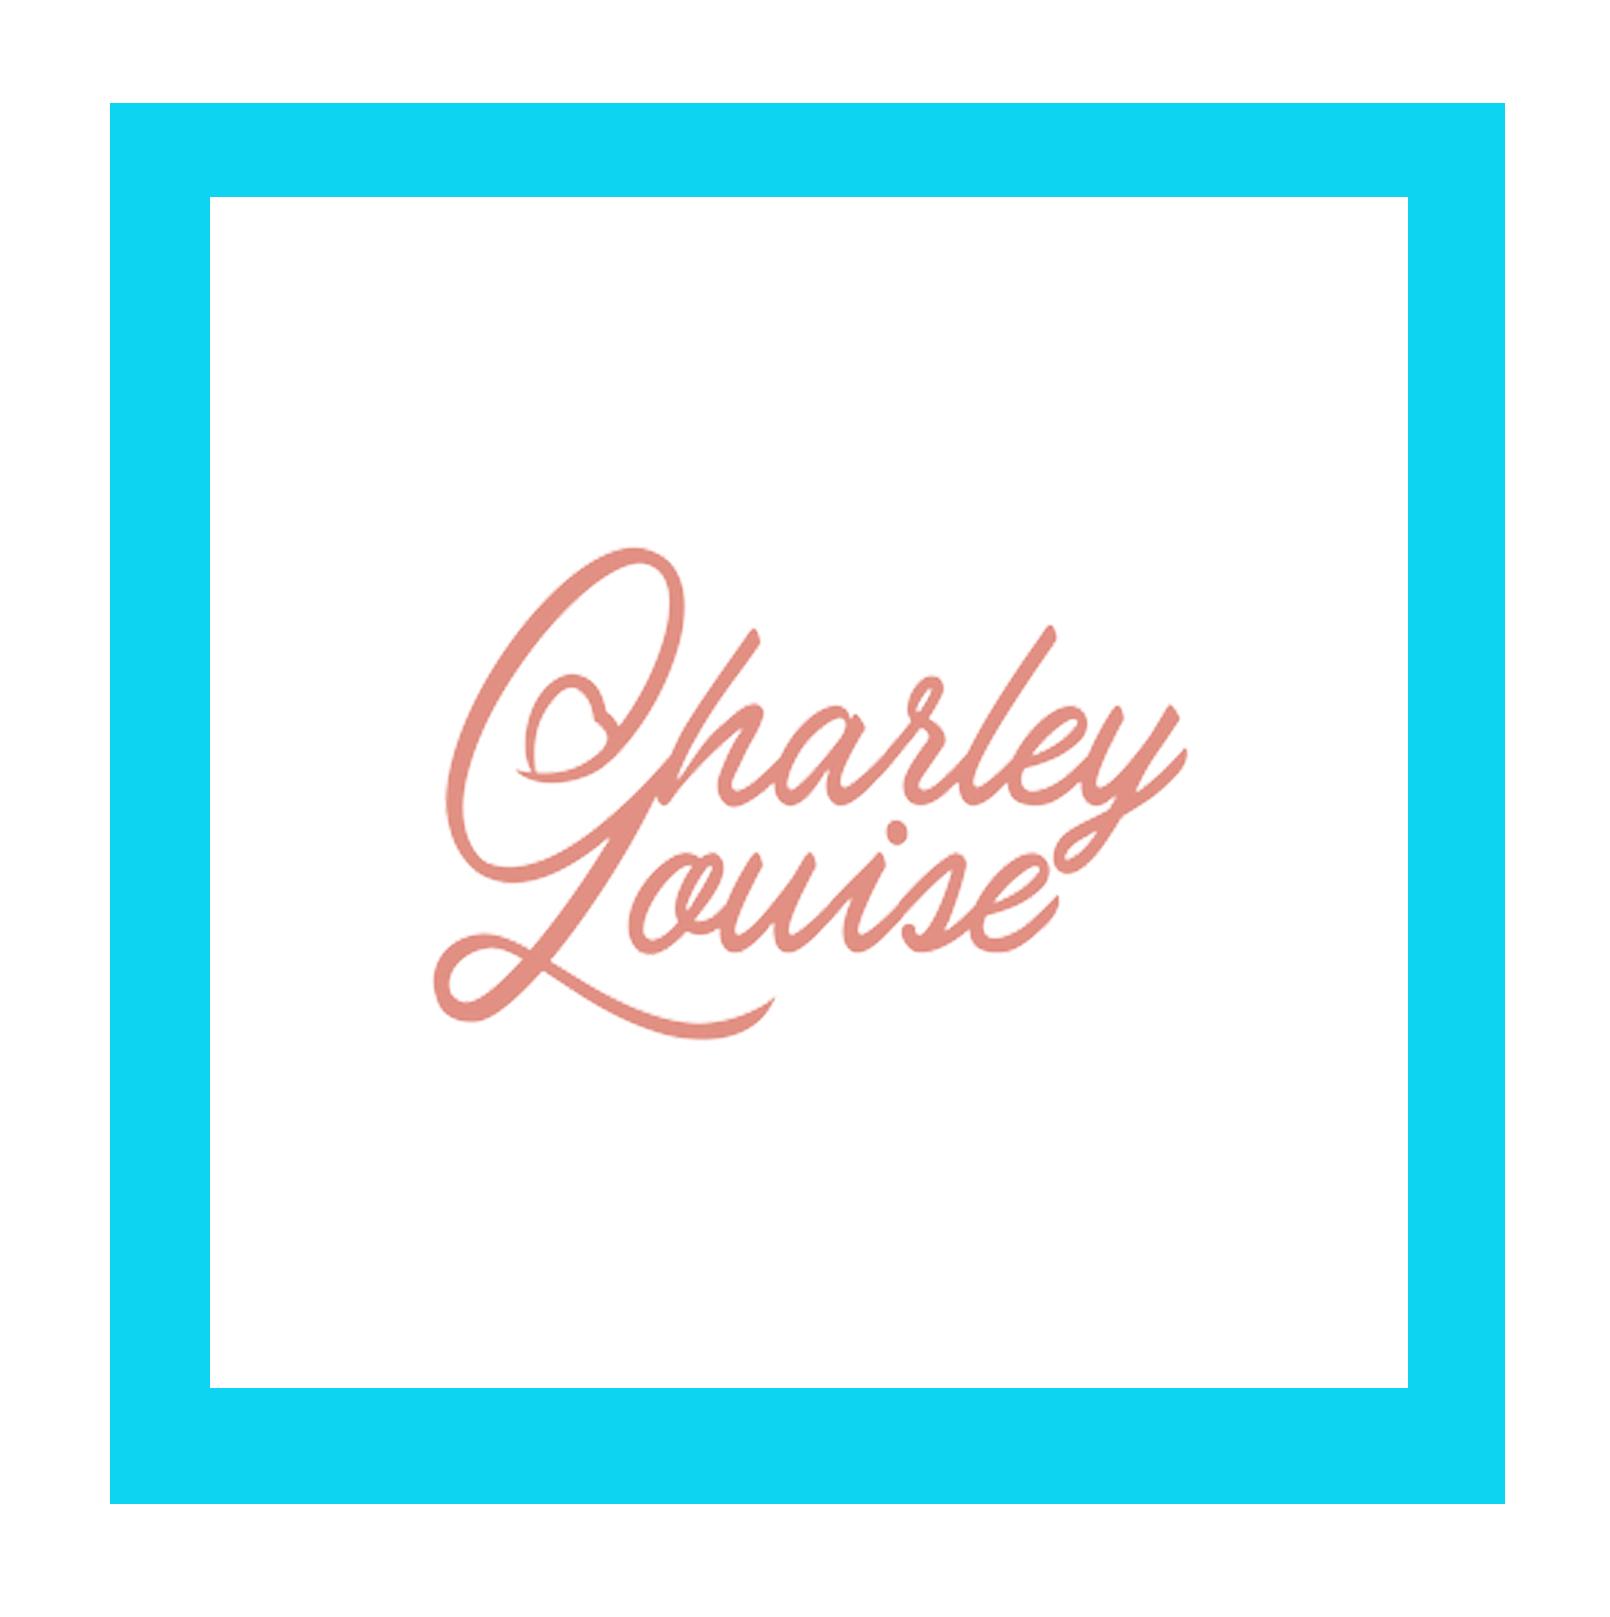 Charleylouise.jpg